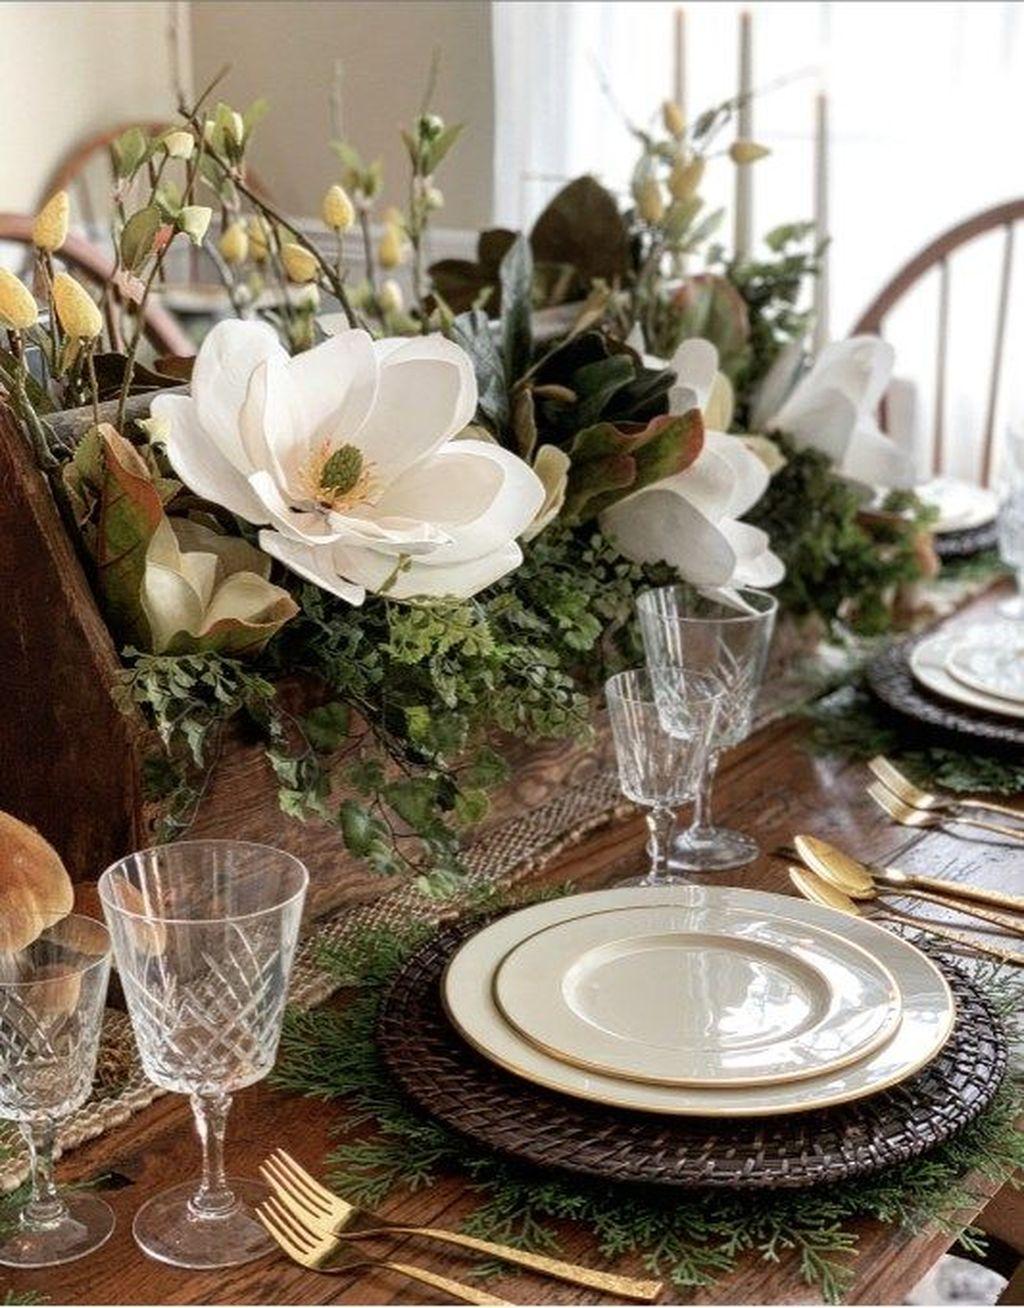 The Best Farmhouse Style Spring Tablescape Decor Ideas 16